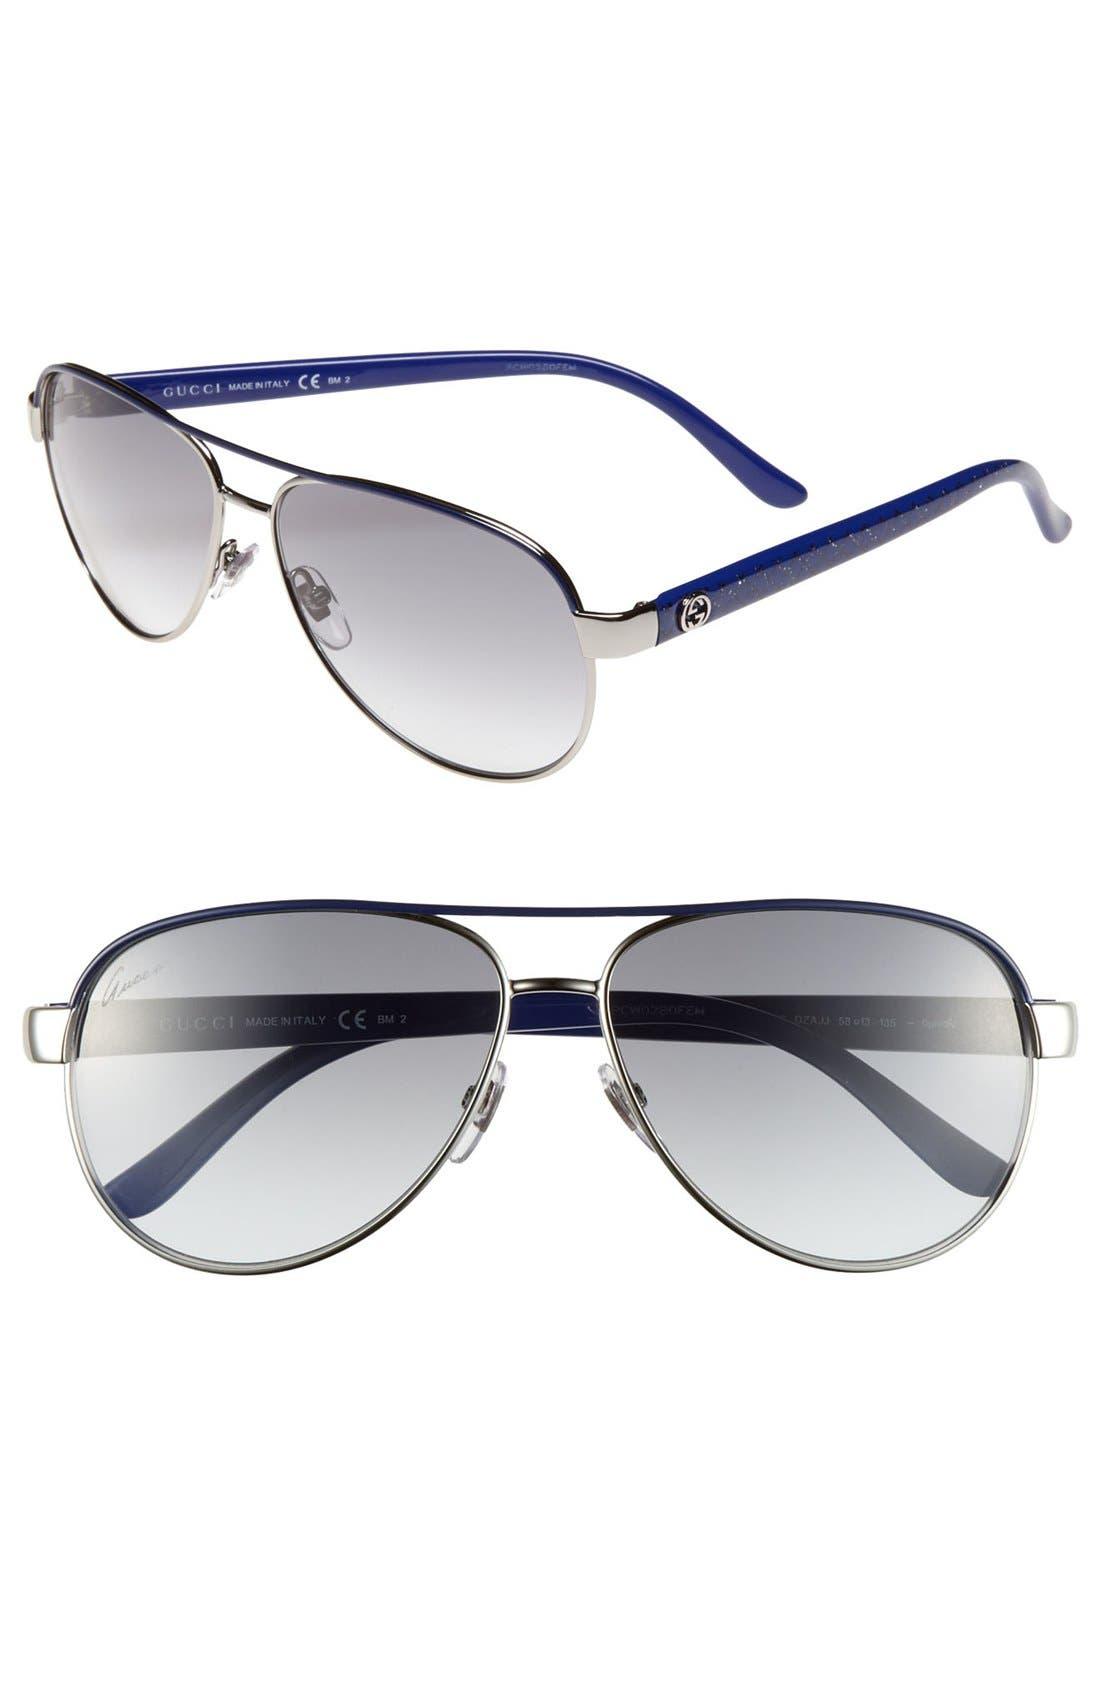 Main Image - Gucci Metal 58mm Aviator Sunglasses